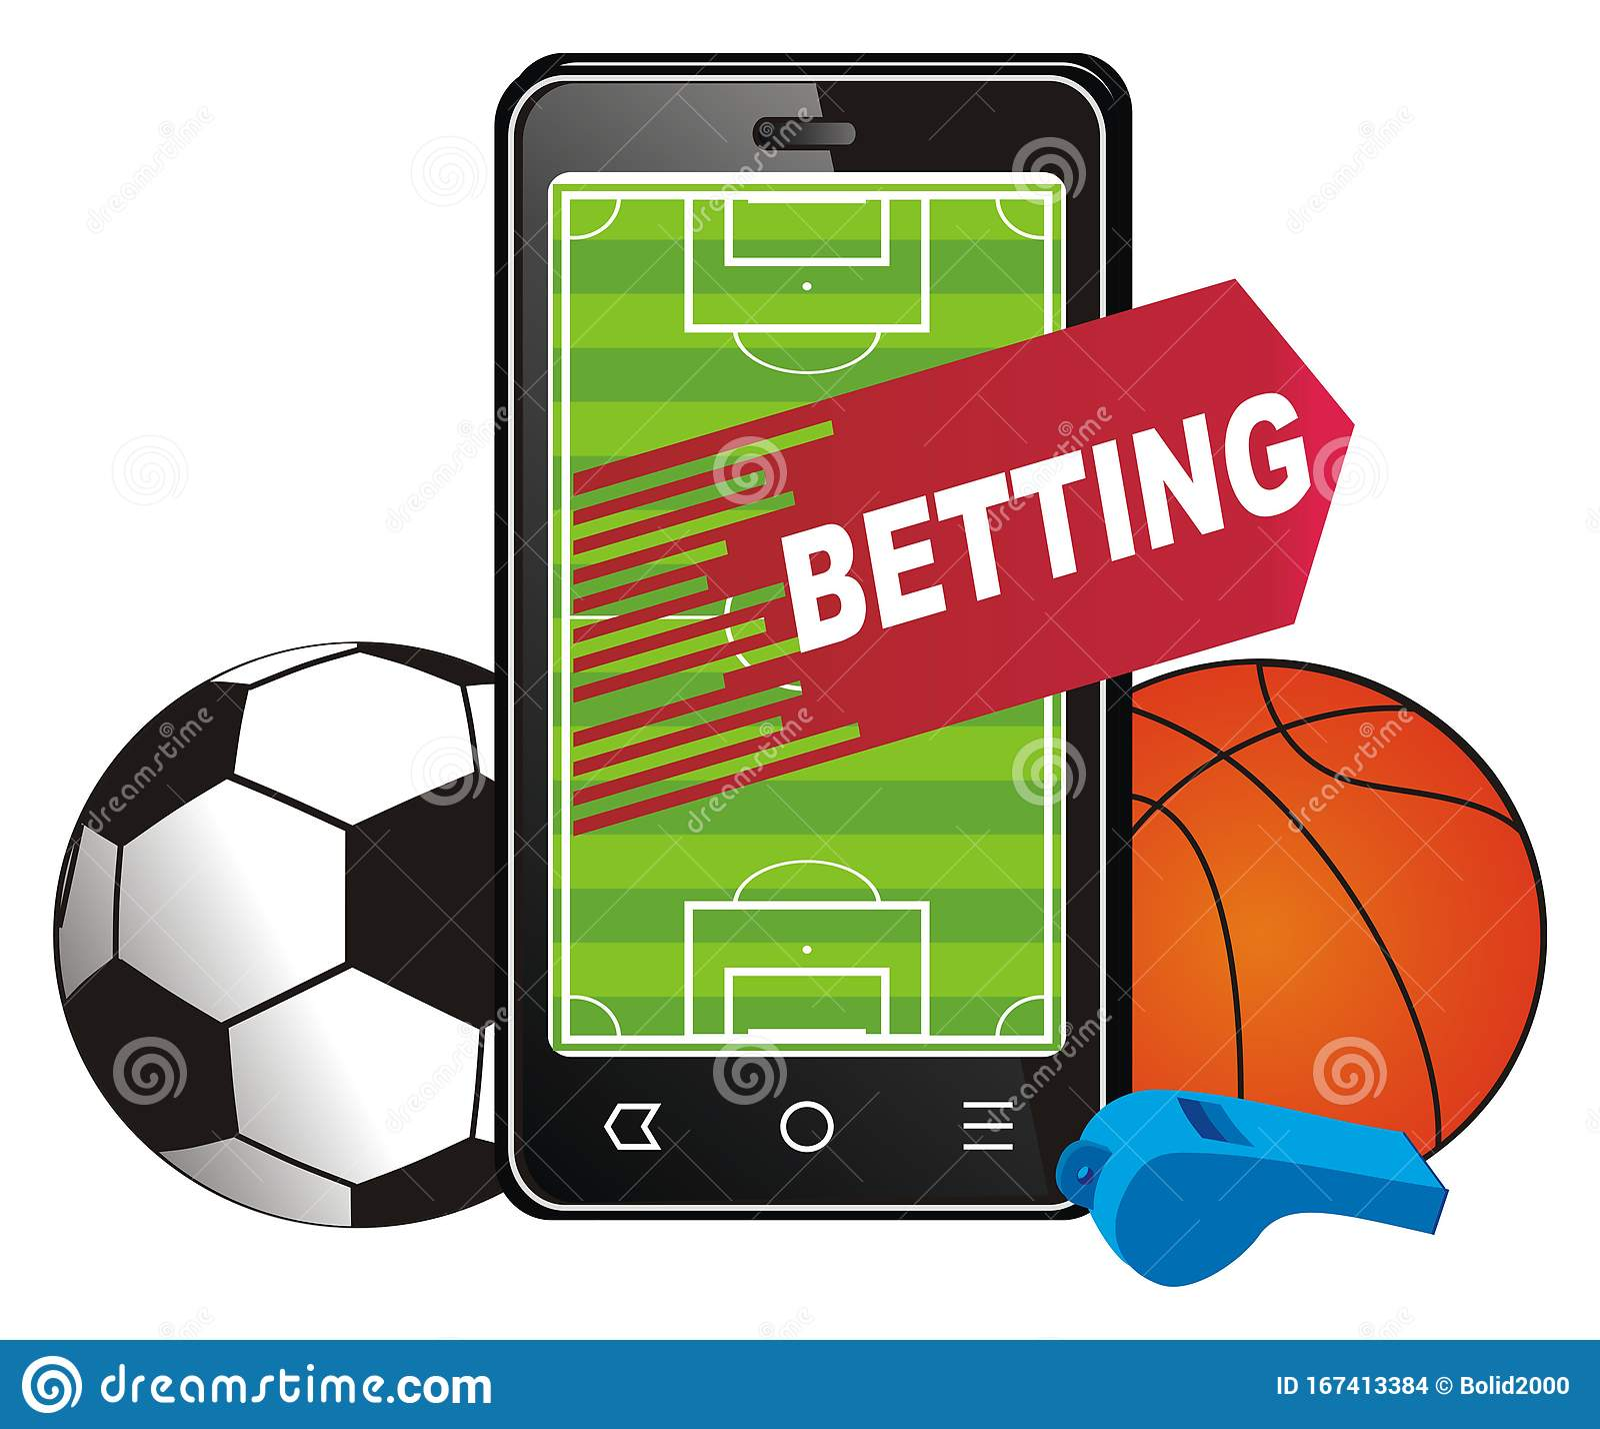 Itsagoal betting topsport free betting